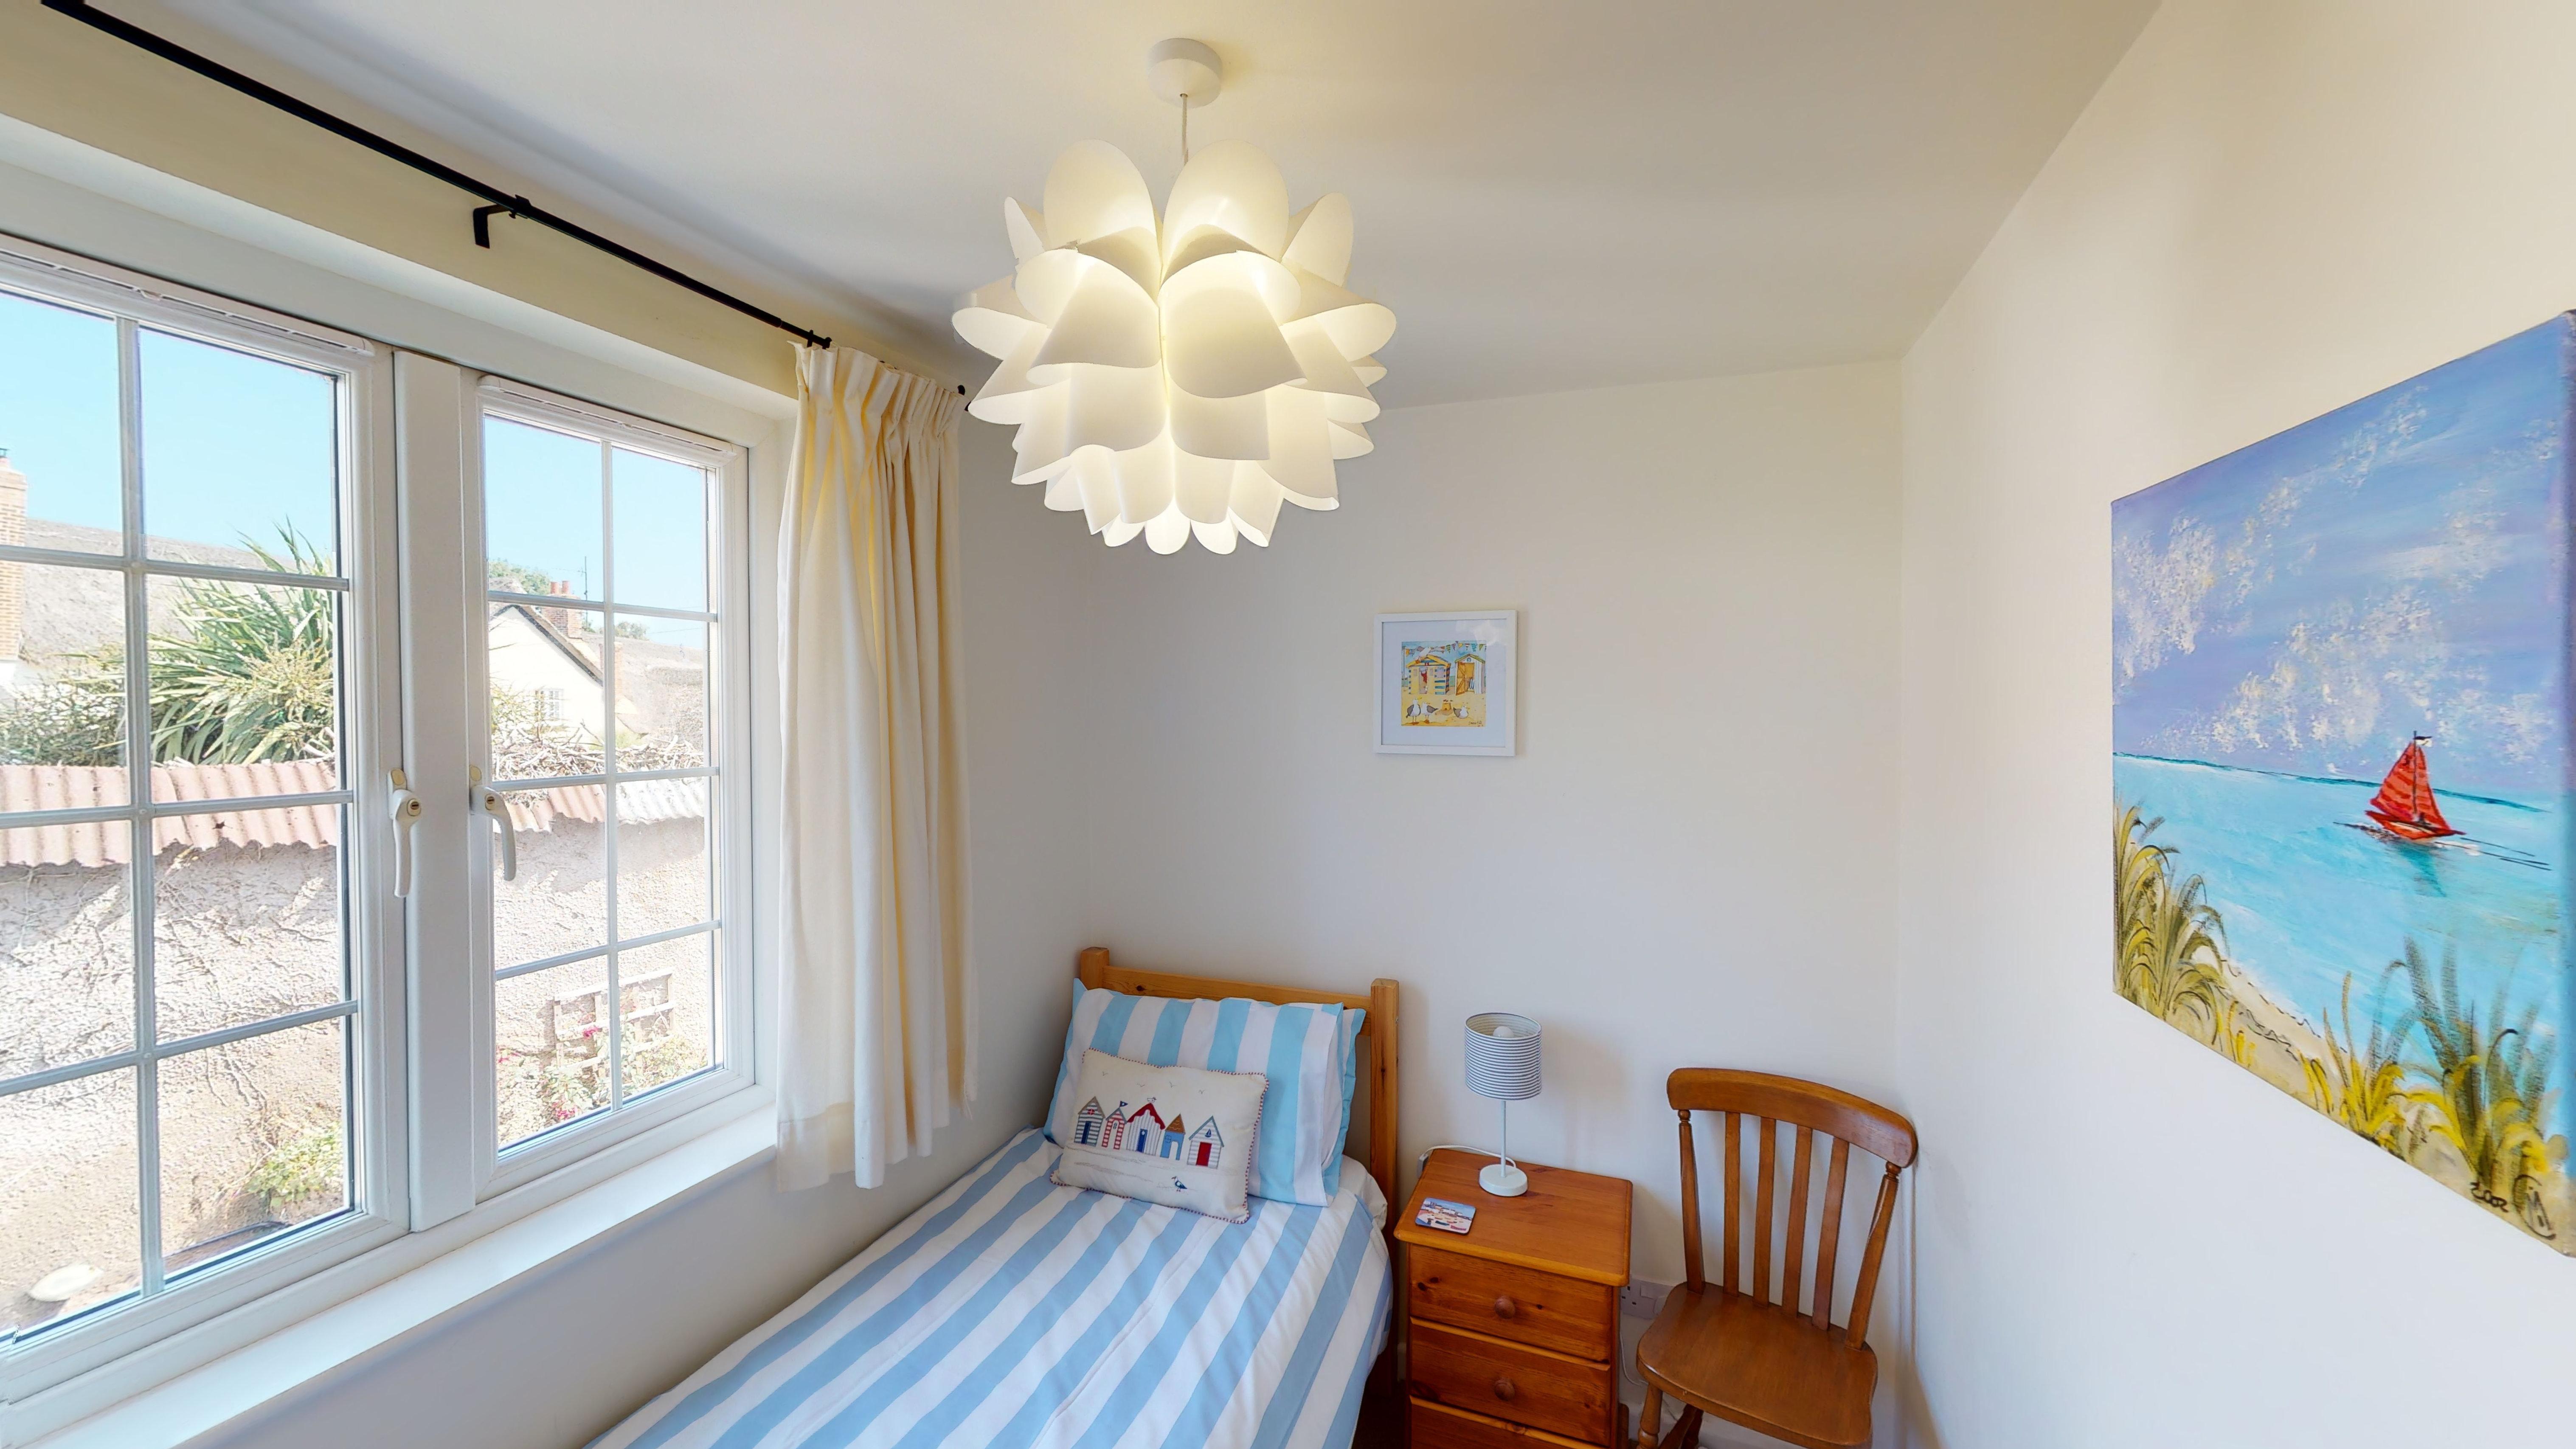 Primrose Cottage 07252020 141026